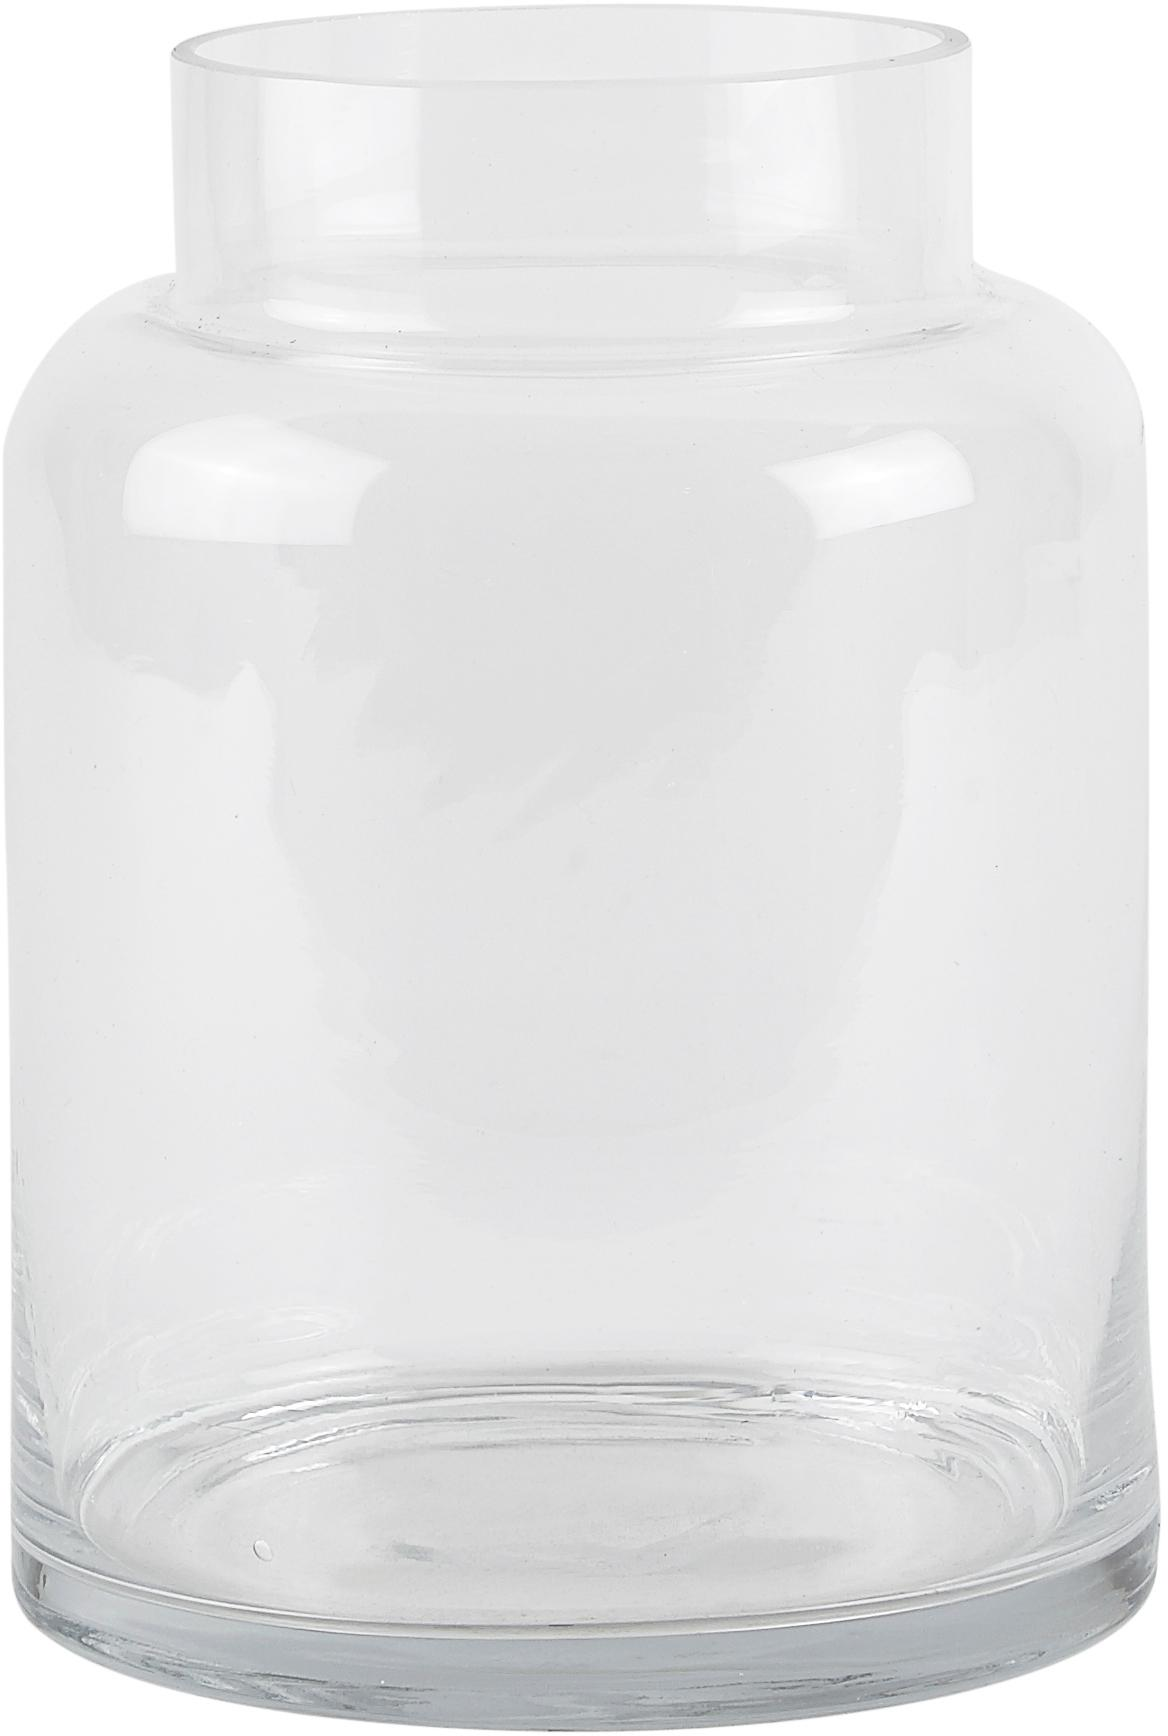 Glas-Vase Lanti, Glas, Transparent, Ø 15 x H 20 cm